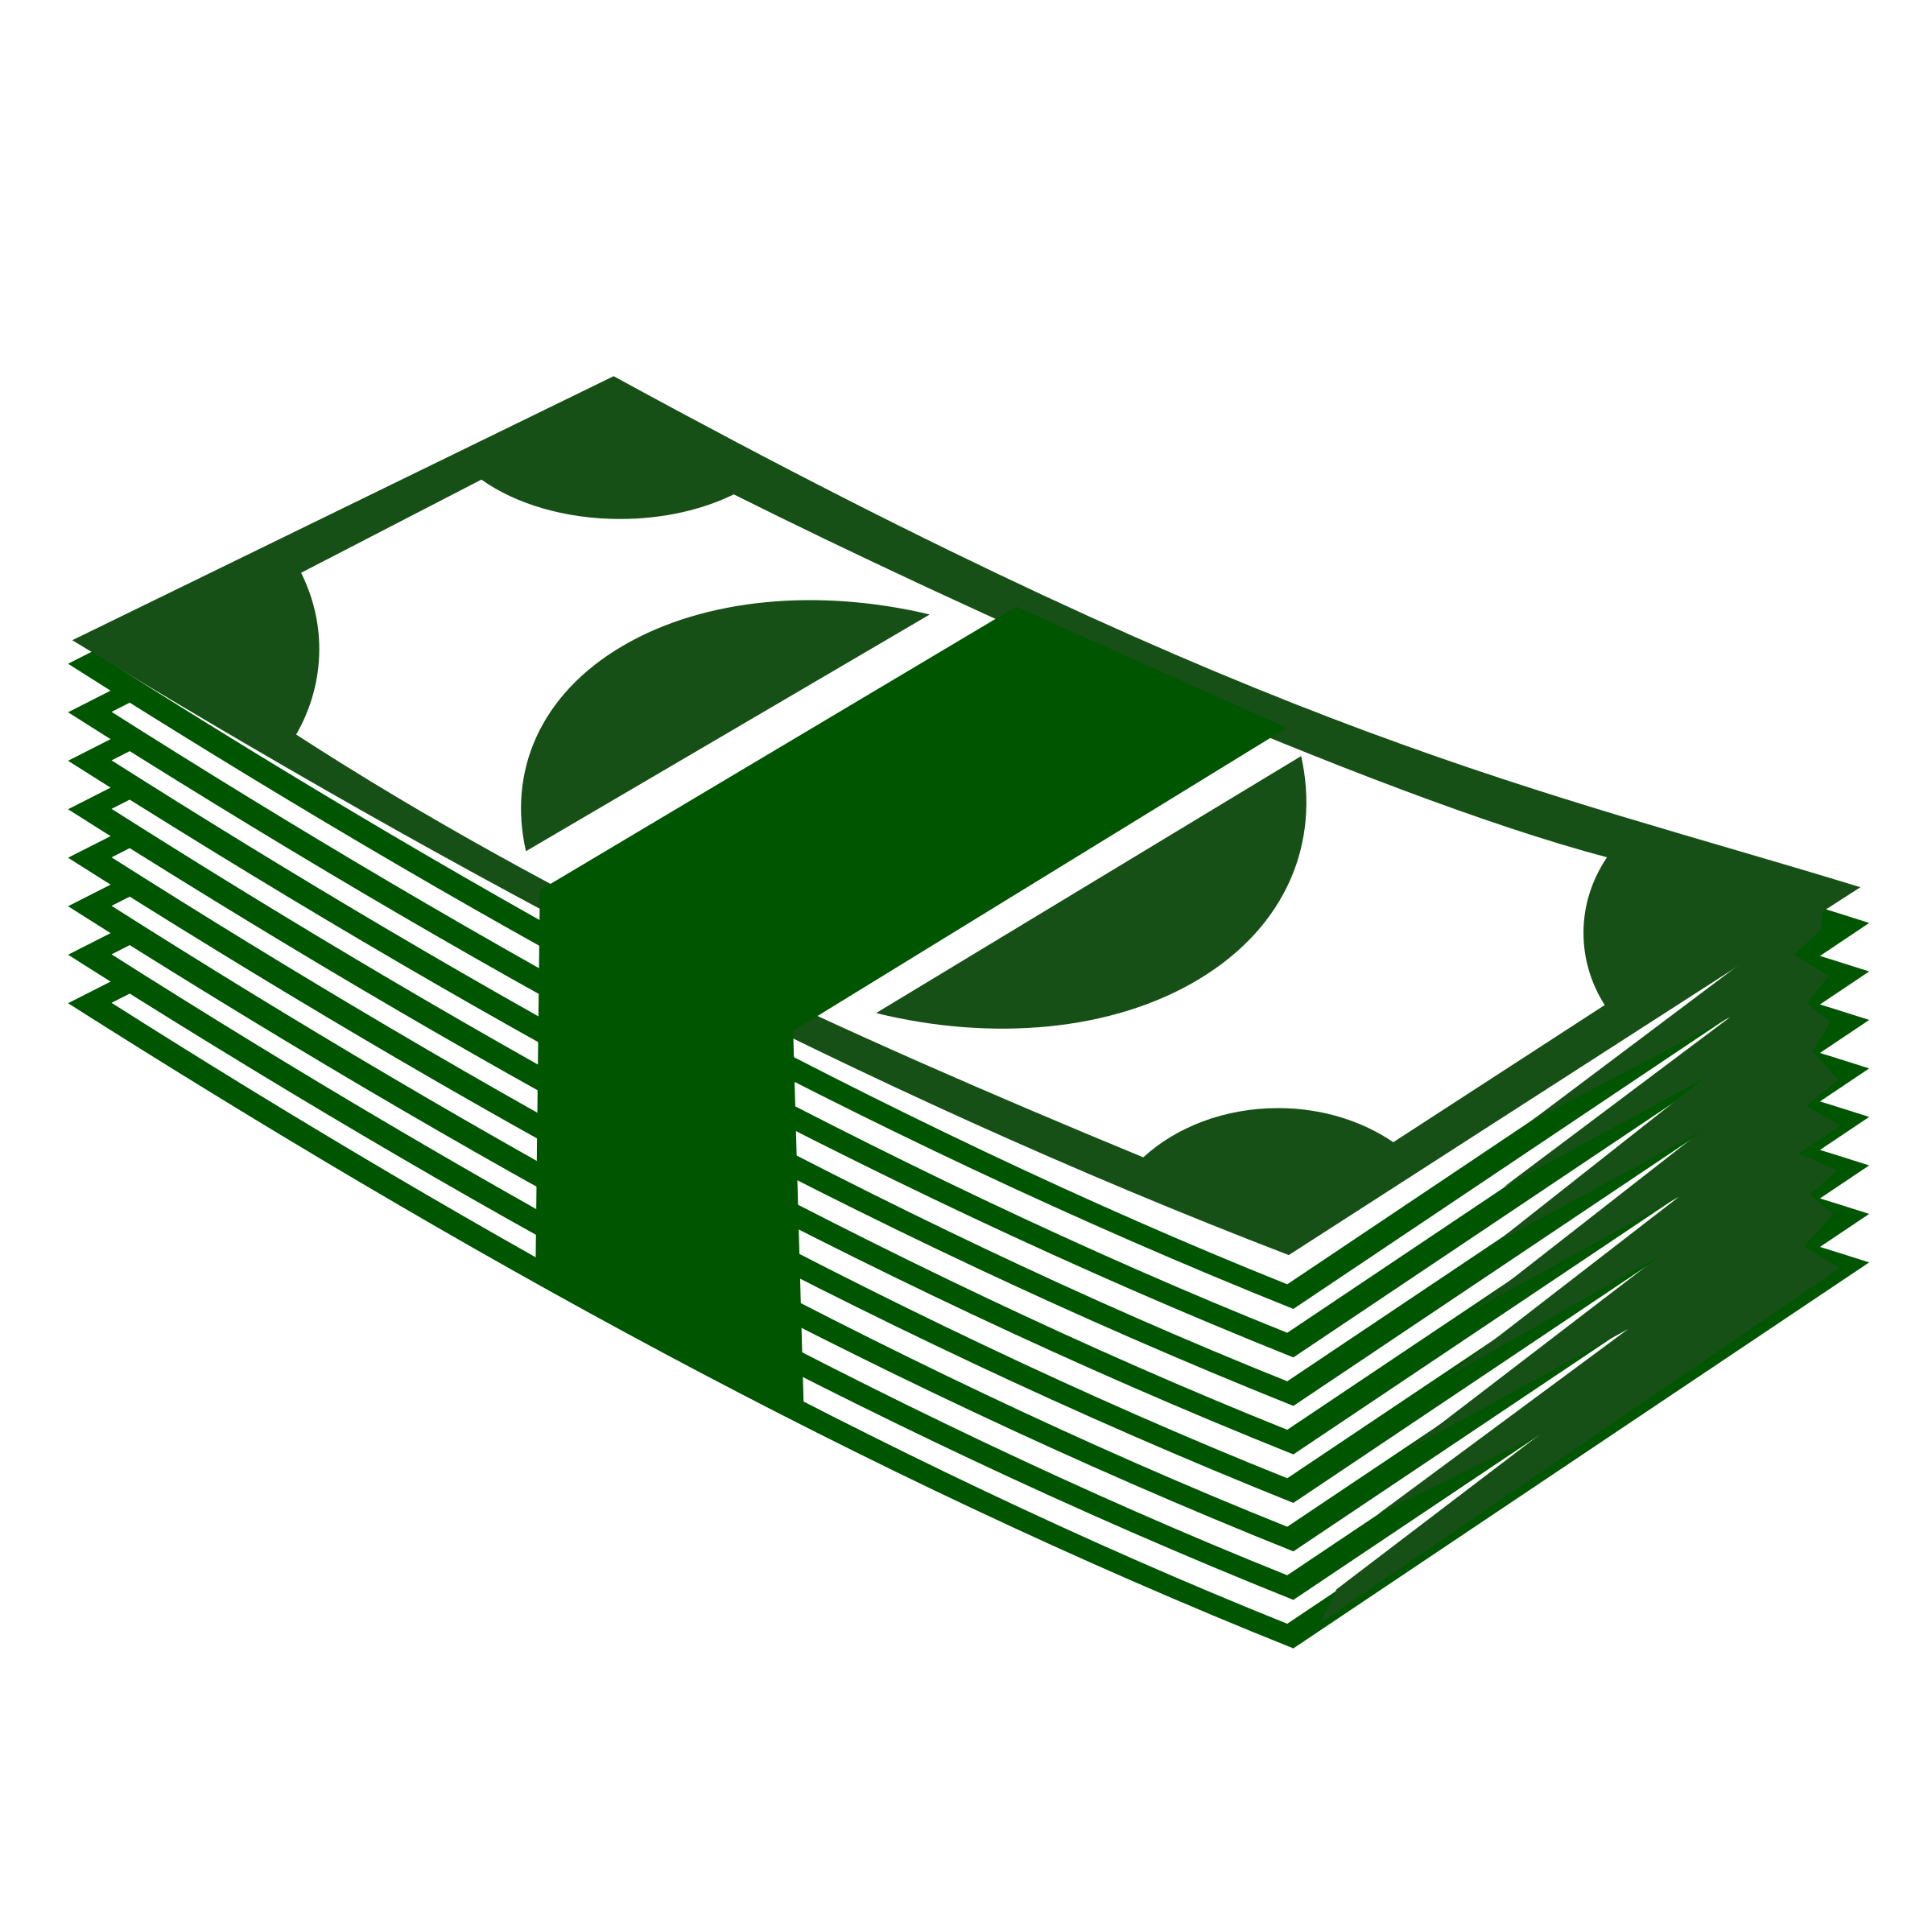 money clip art free printable clipart panda free clipart images rh clipartpanda com money clip art designs money clipart black and white